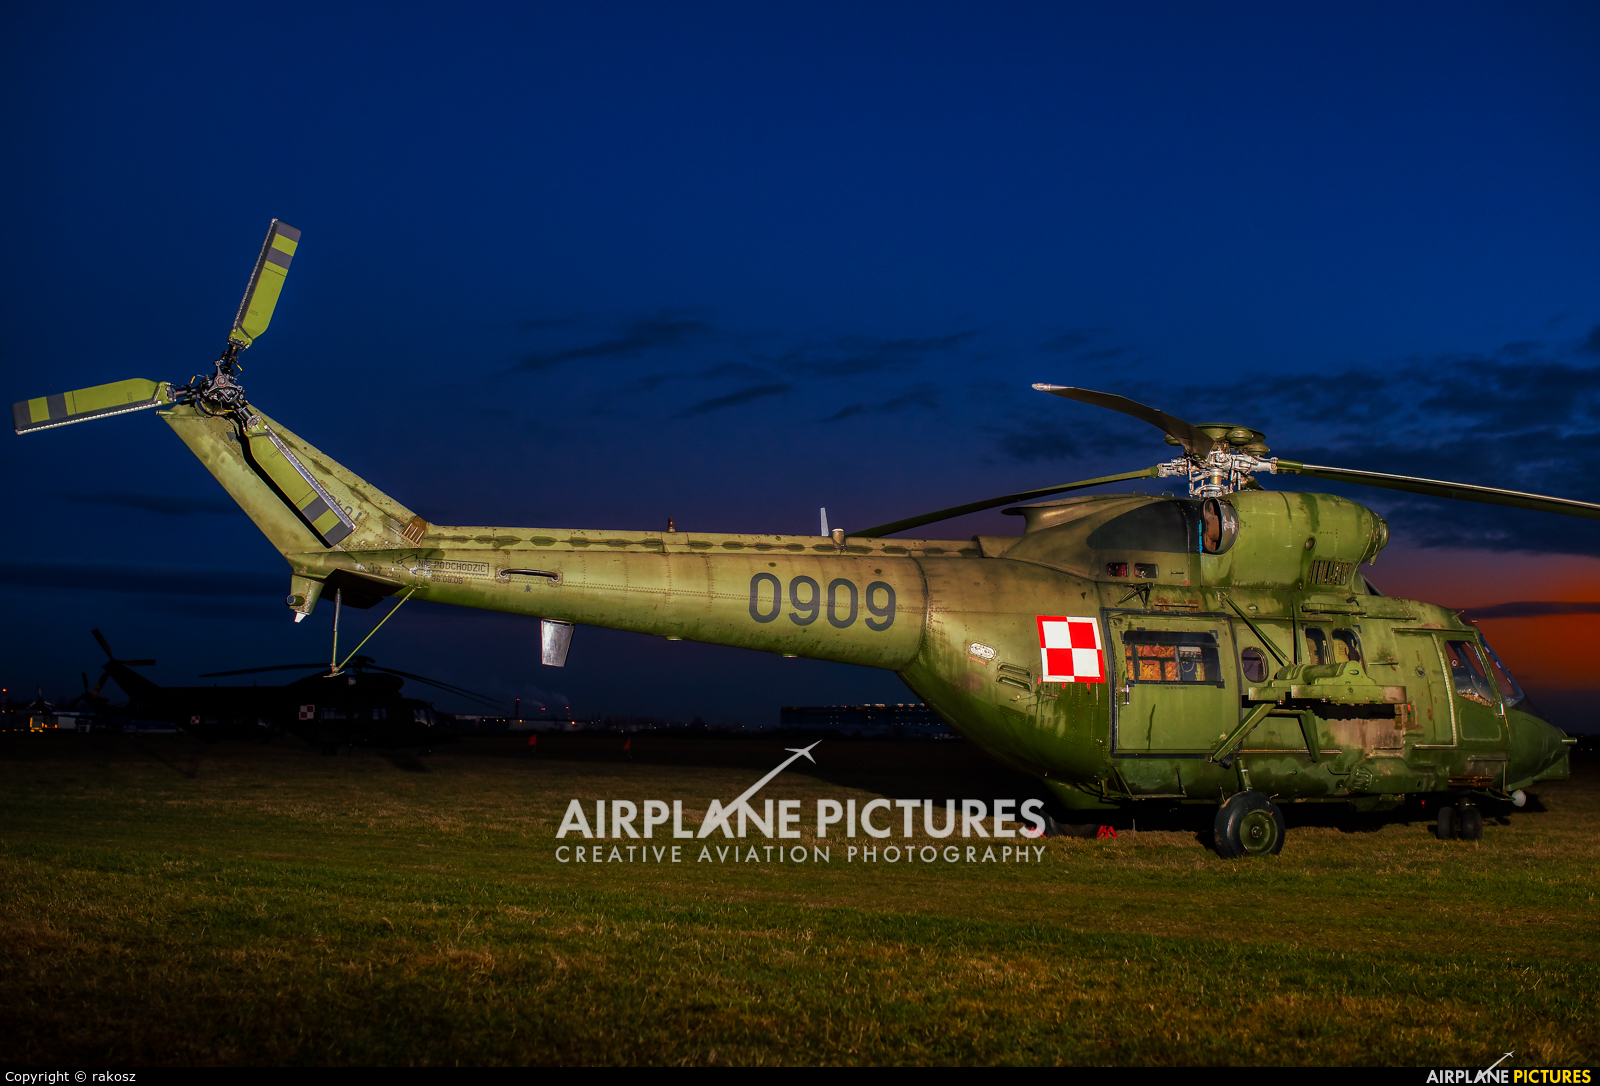 Poland - Army 0909 aircraft at Gliwice